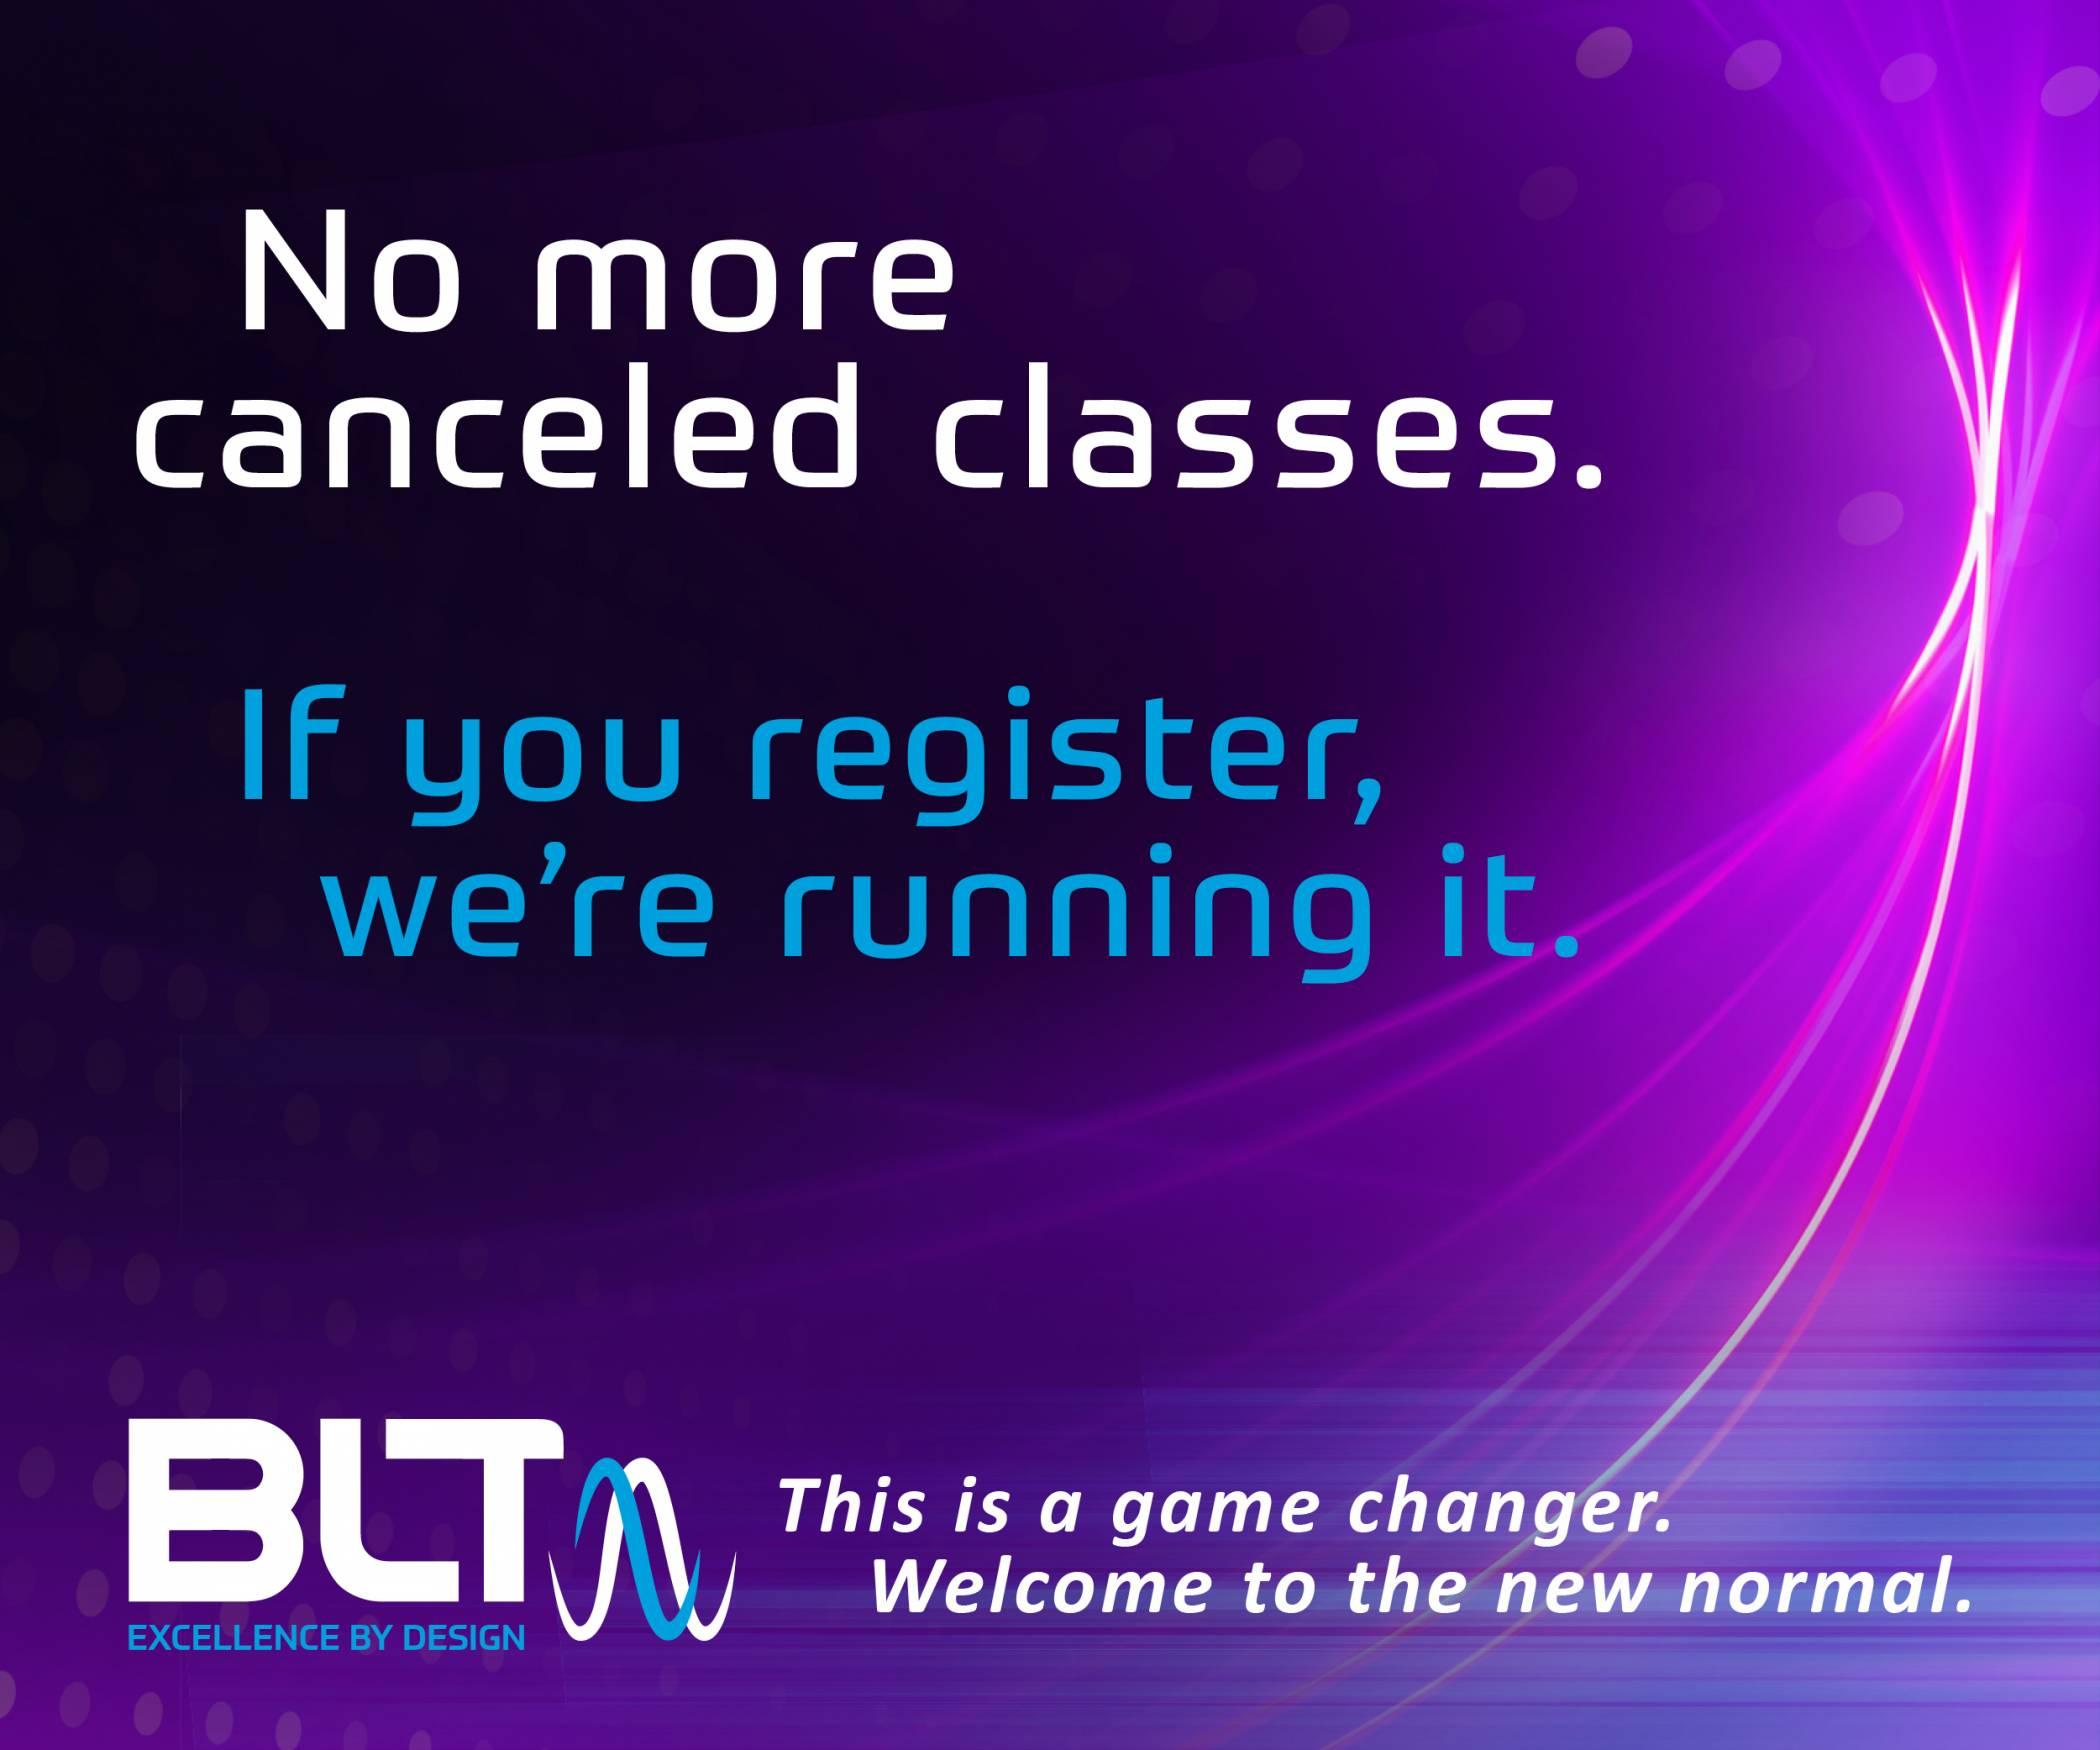 No more canceled classes